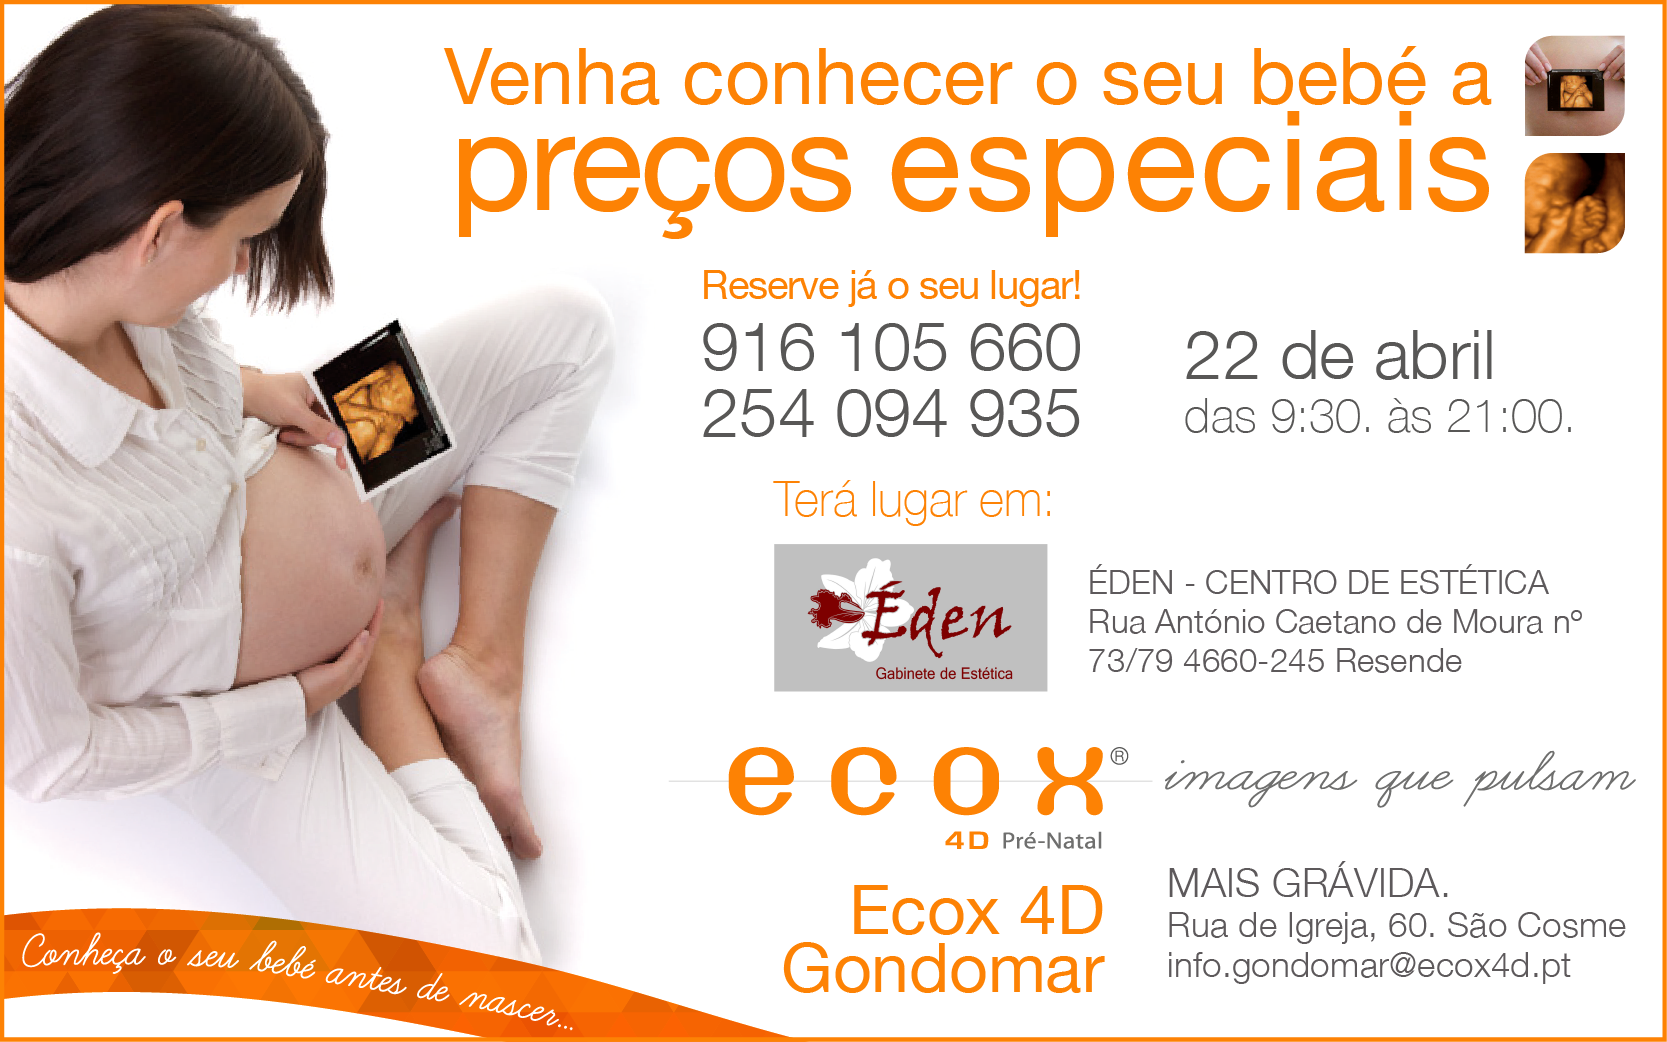 Ecox PT Gondomar - Ev Sesiones especiales 22-04-17